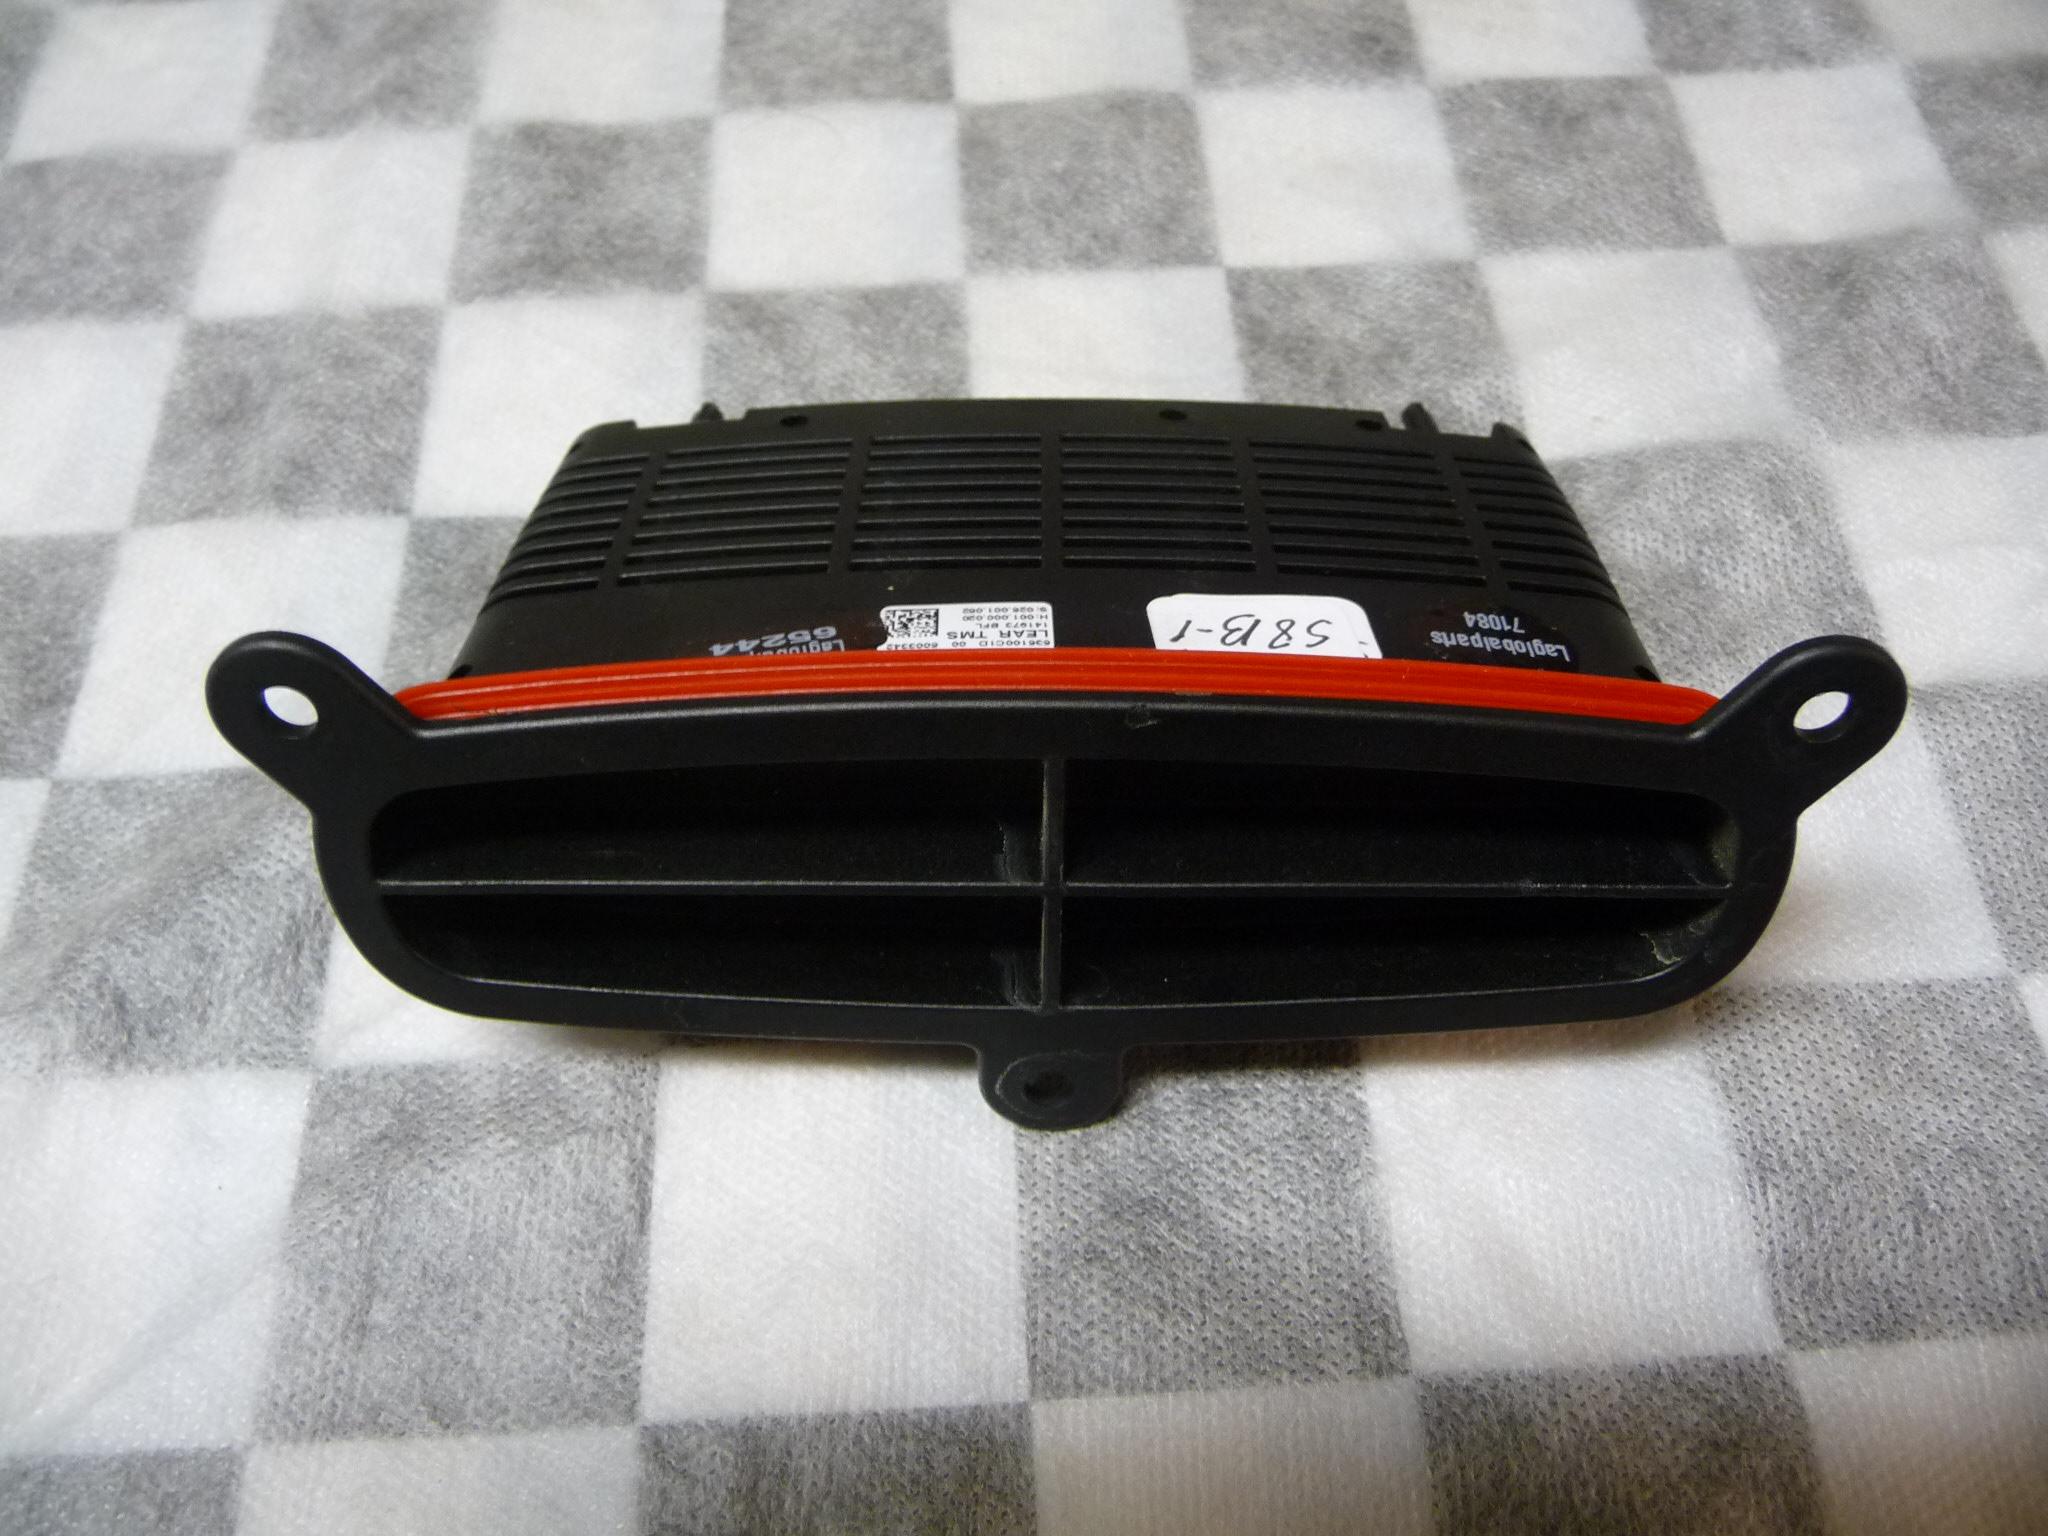 BMW 4 Series X5 X6 F82 E70 Headlight Control Module 7405210 OEM OE